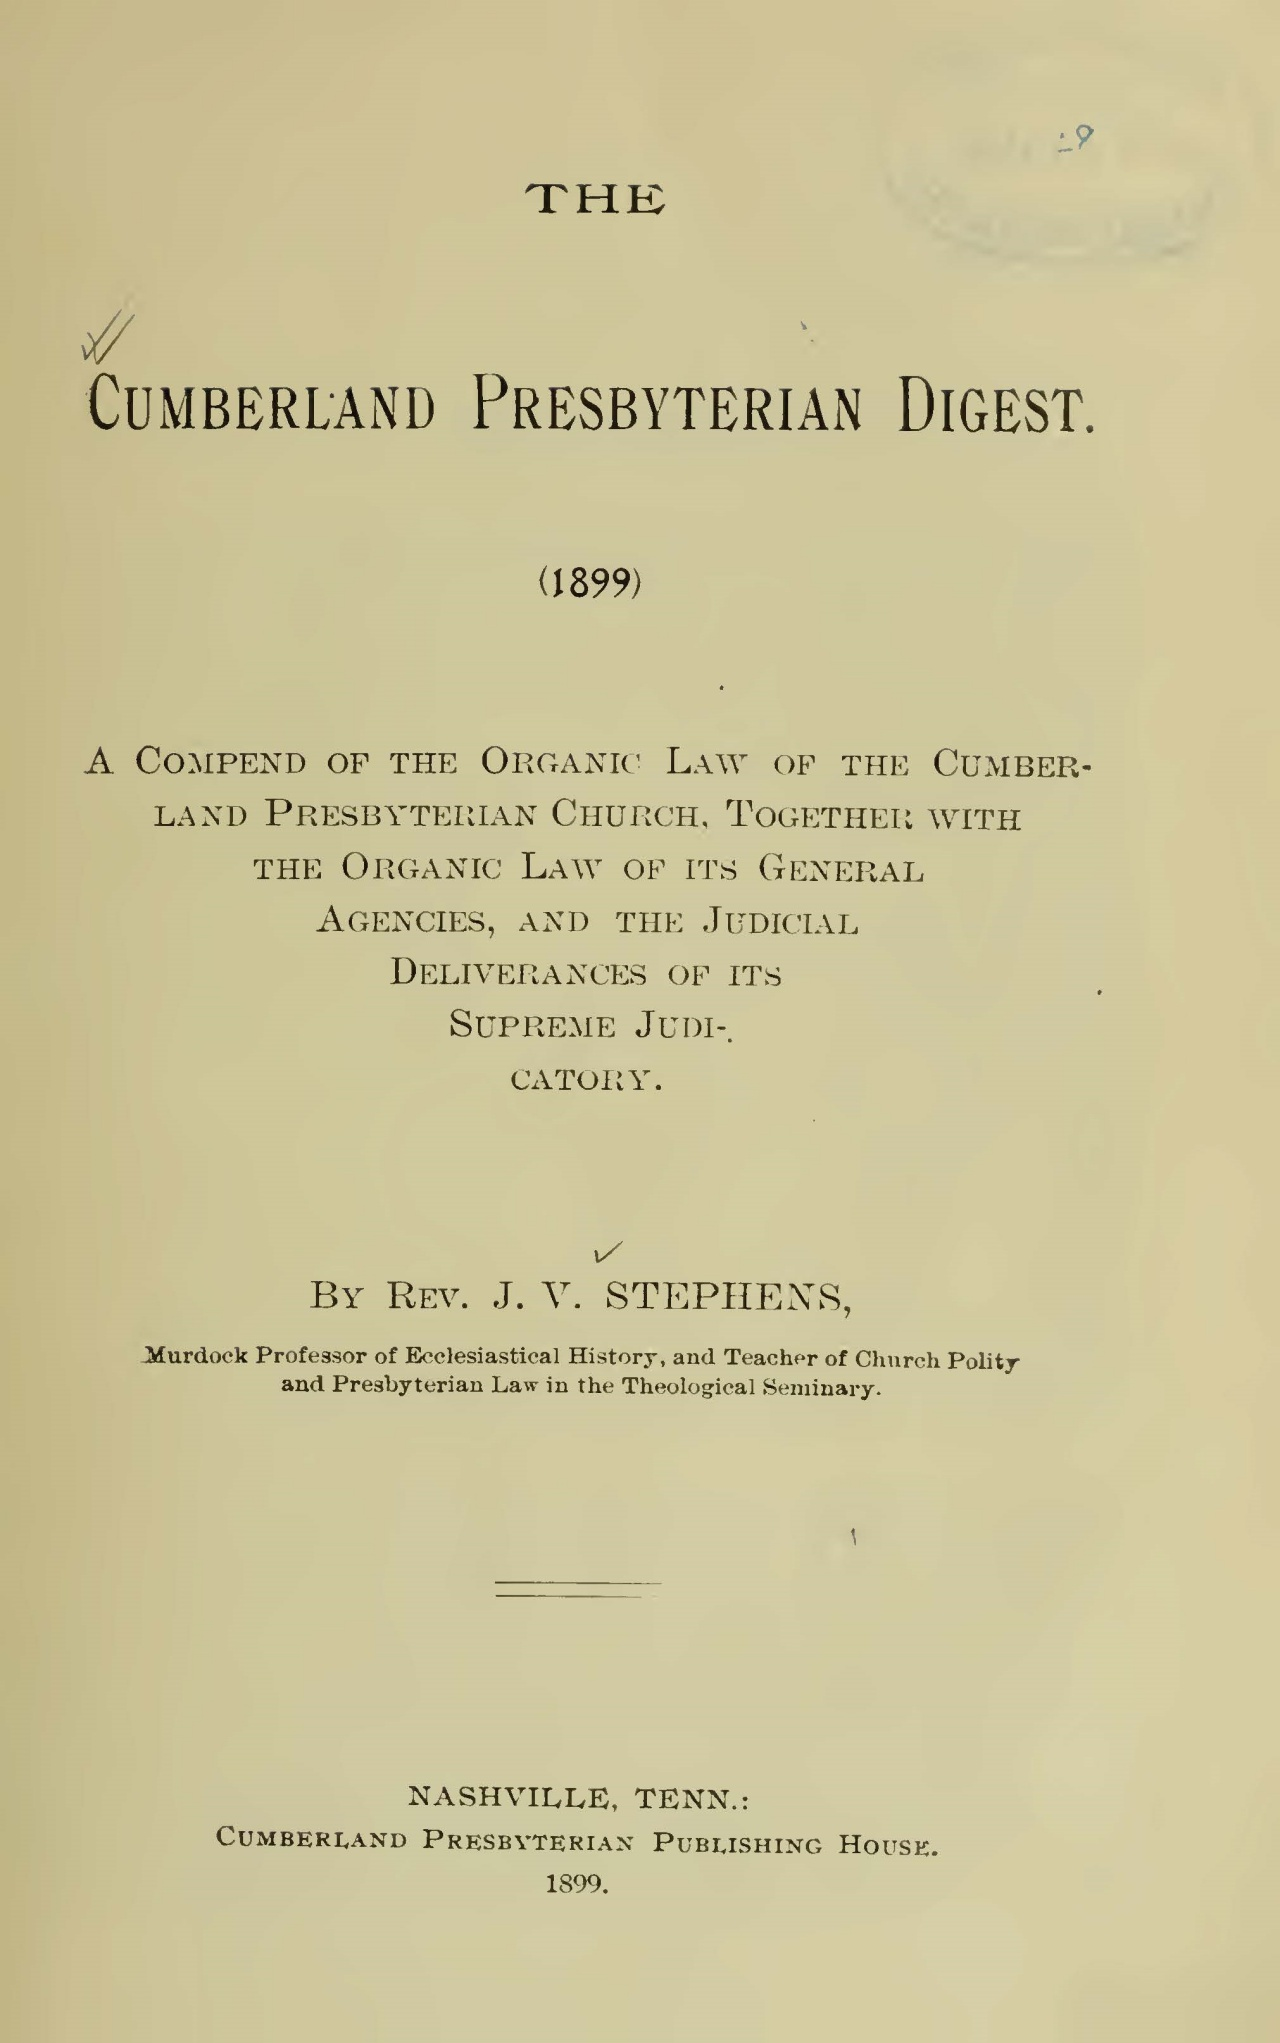 Vant Stephens, Sr., John, The Cumberland Presbyterian Digest Title Page.jpg